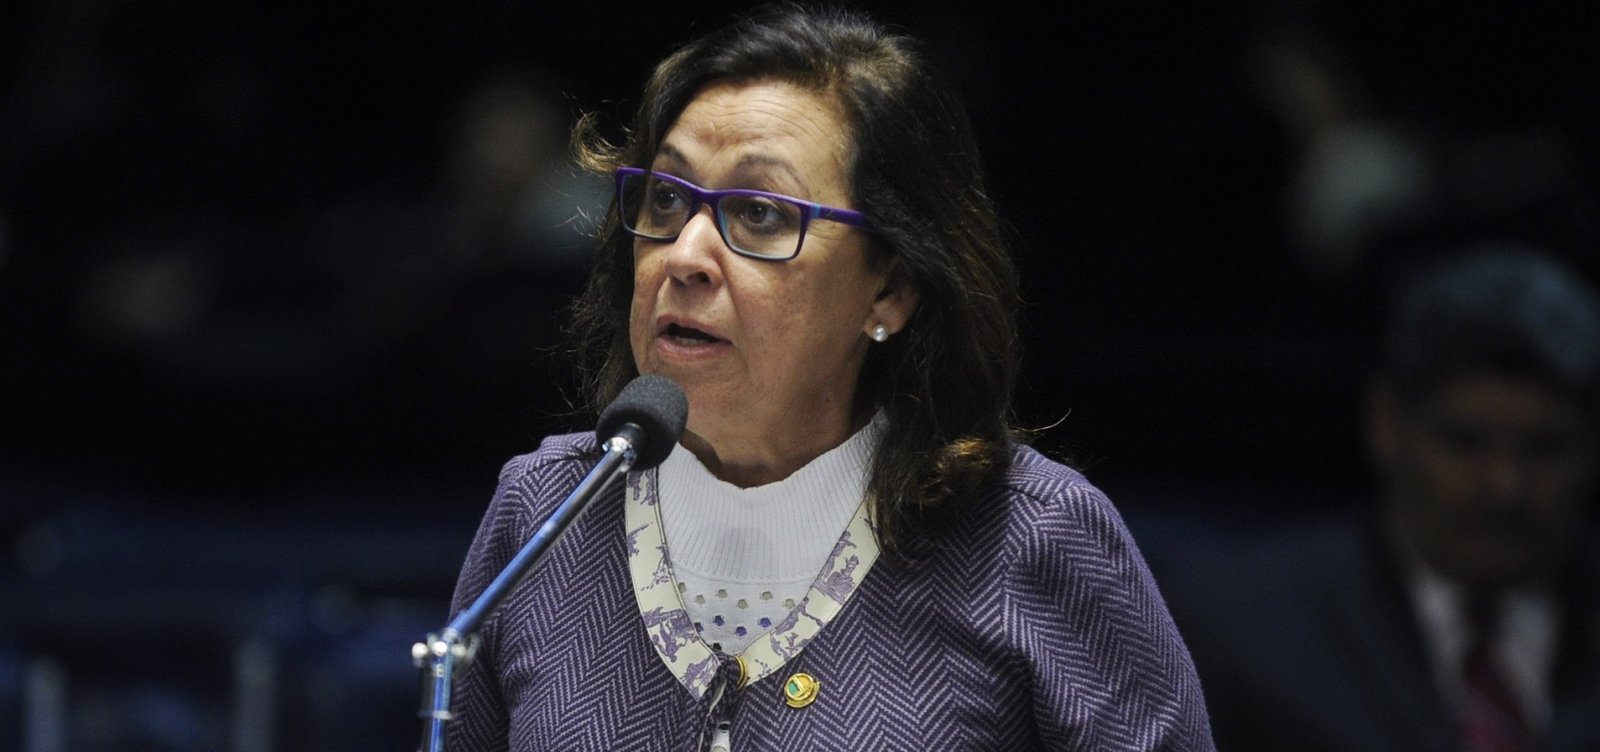 [Lídice diz que é 'lamentável' apoio de Calmon a Bolsonaro: 'Não combina']